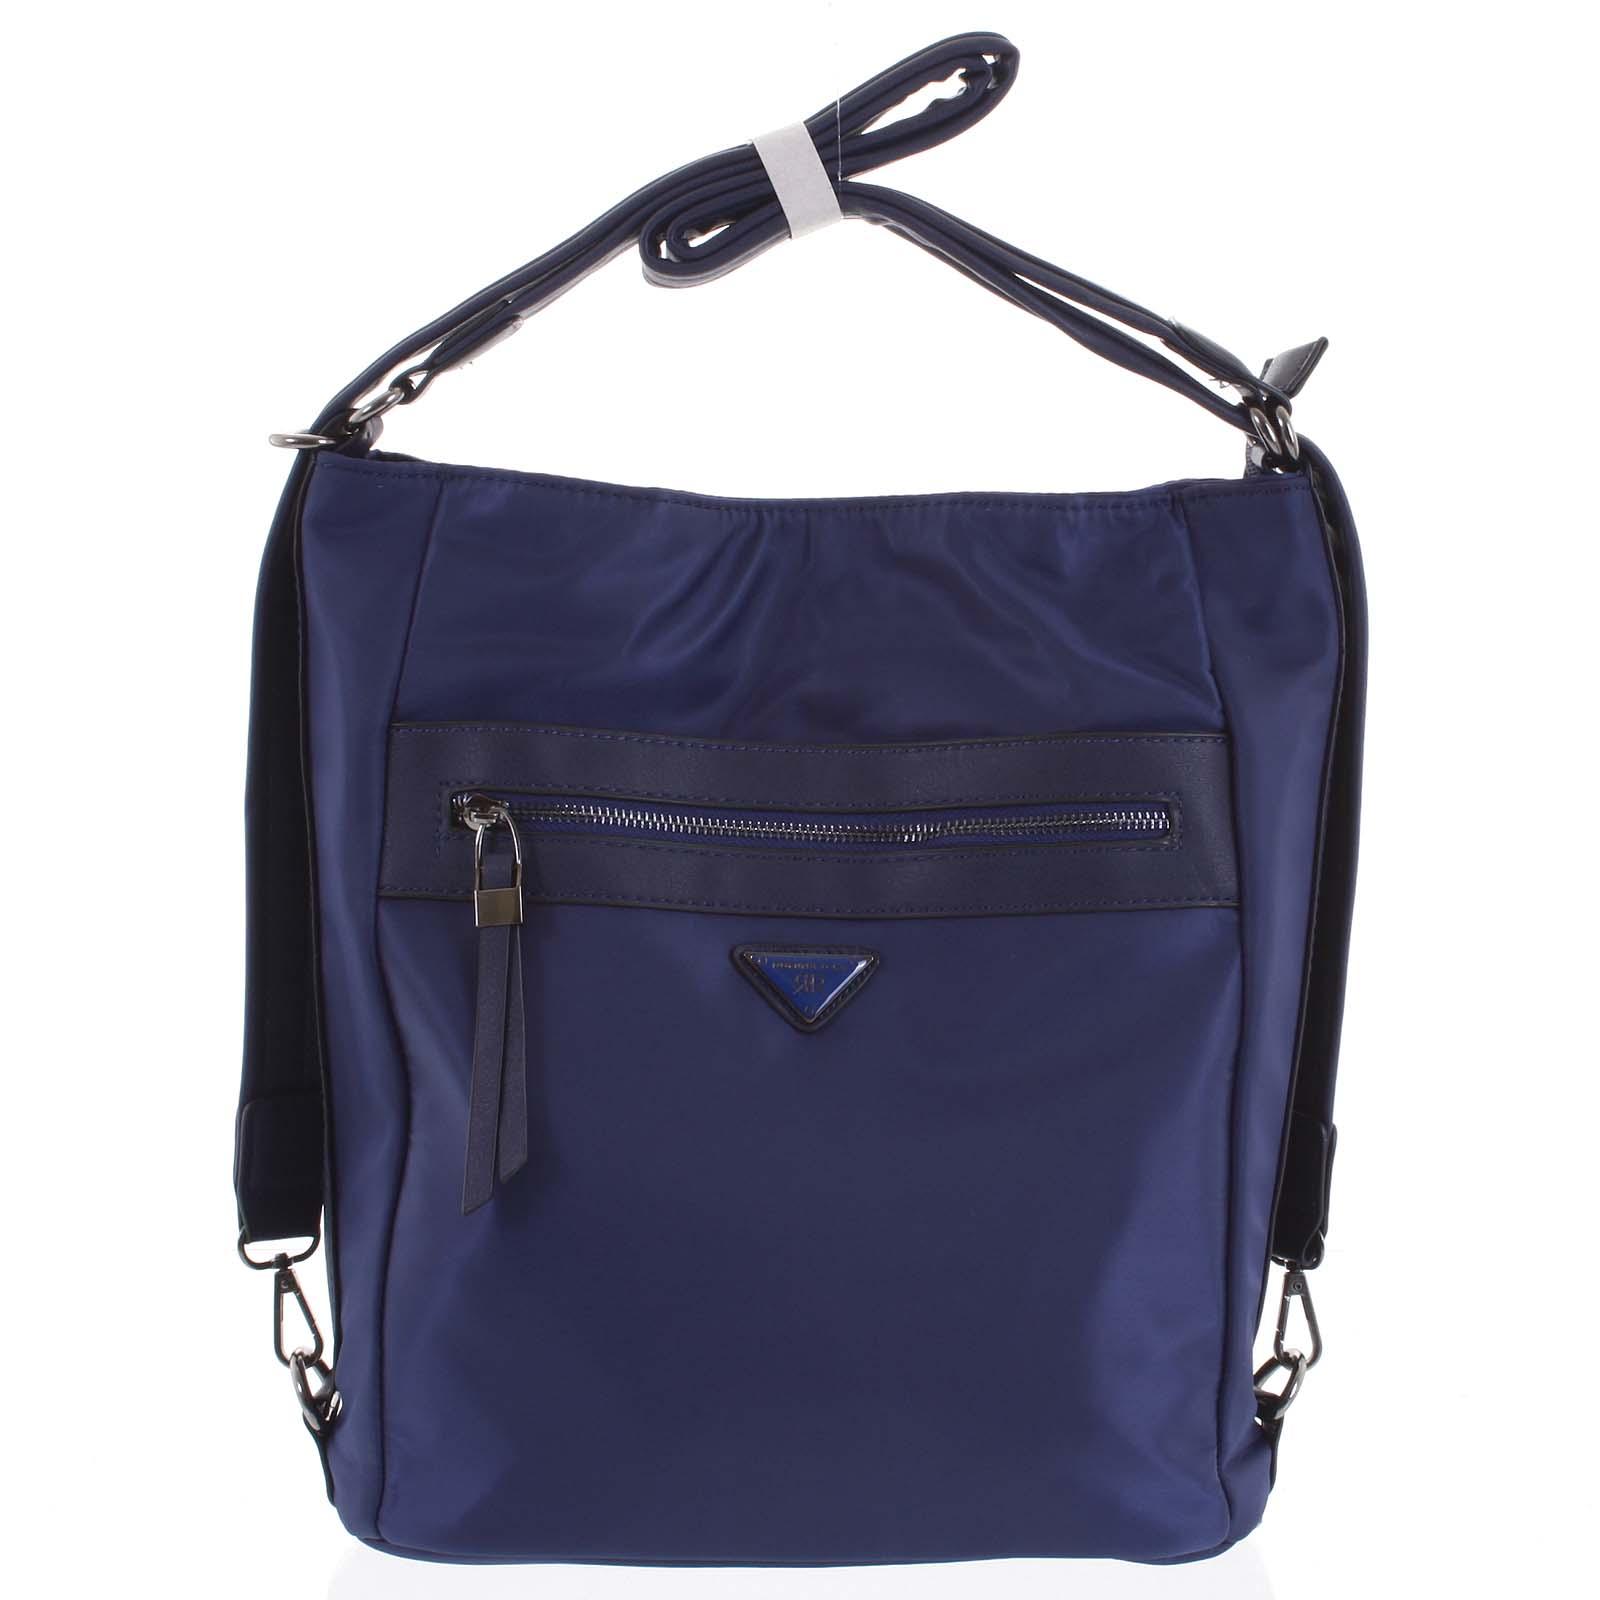 Dámska kabelka batoh modrá - Delami Triana